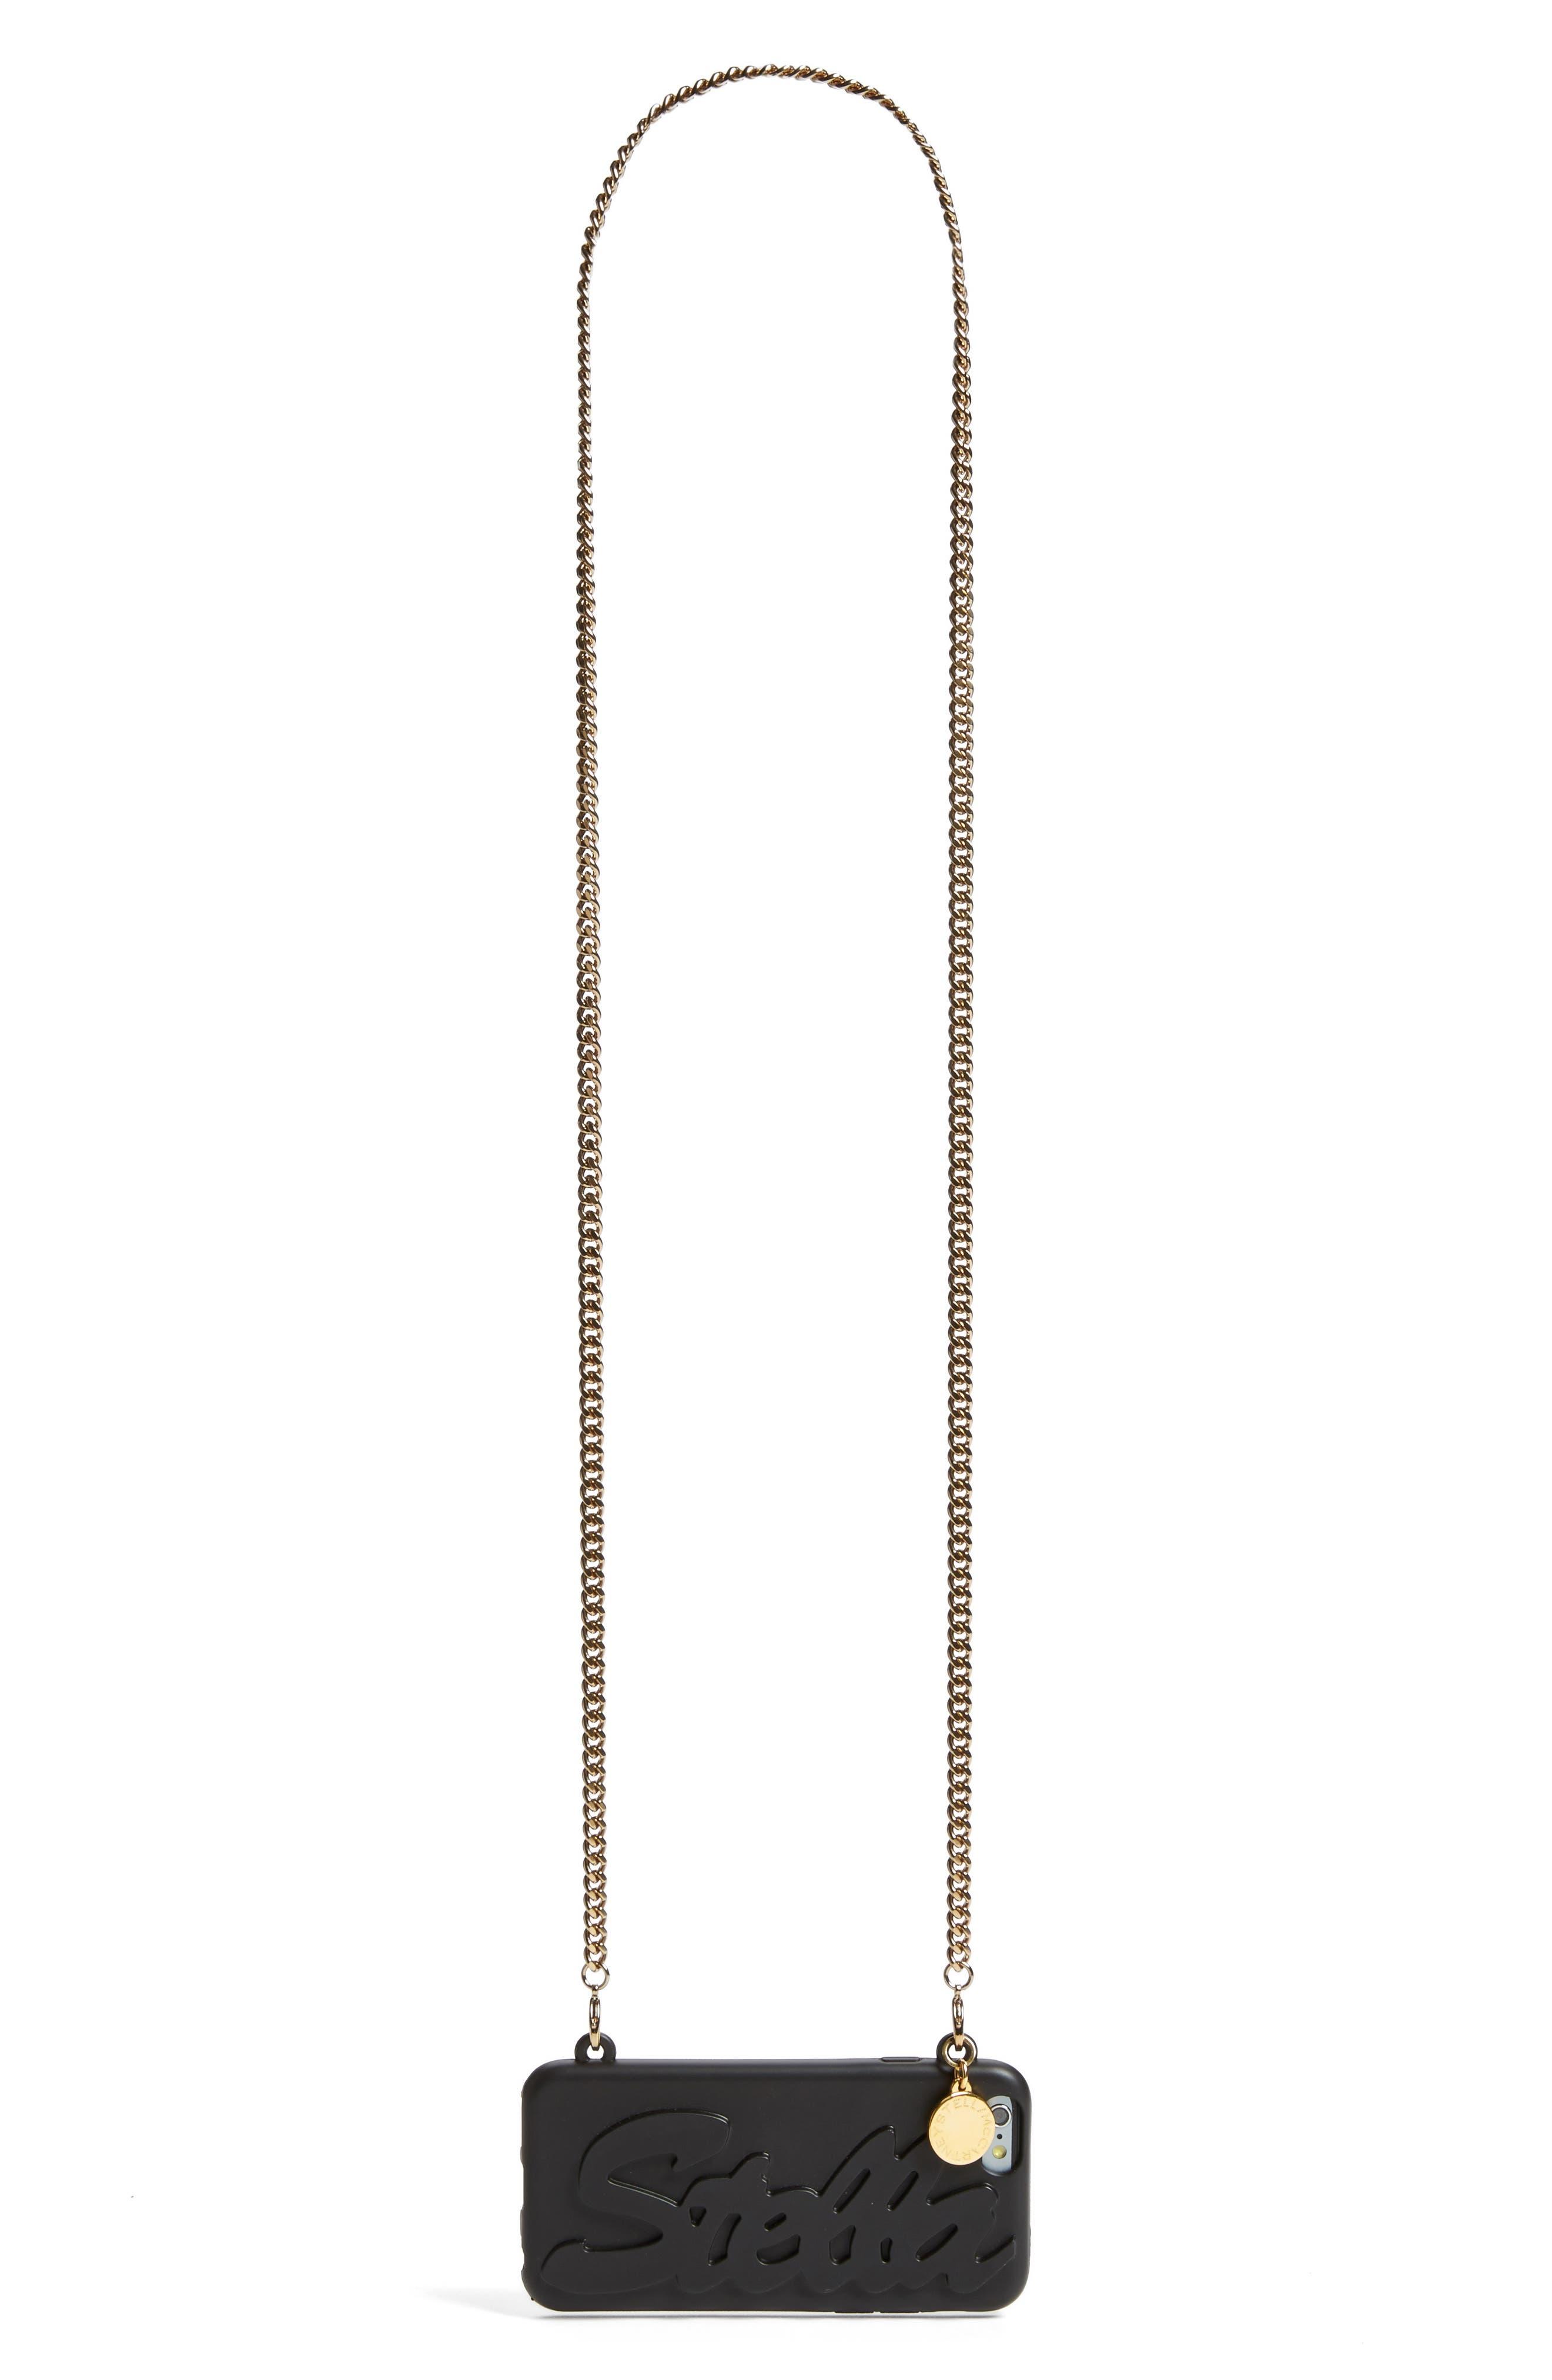 'Stella' iPhone 6 & 6s Crossbody Chain Case,                             Alternate thumbnail 9, color,                             001